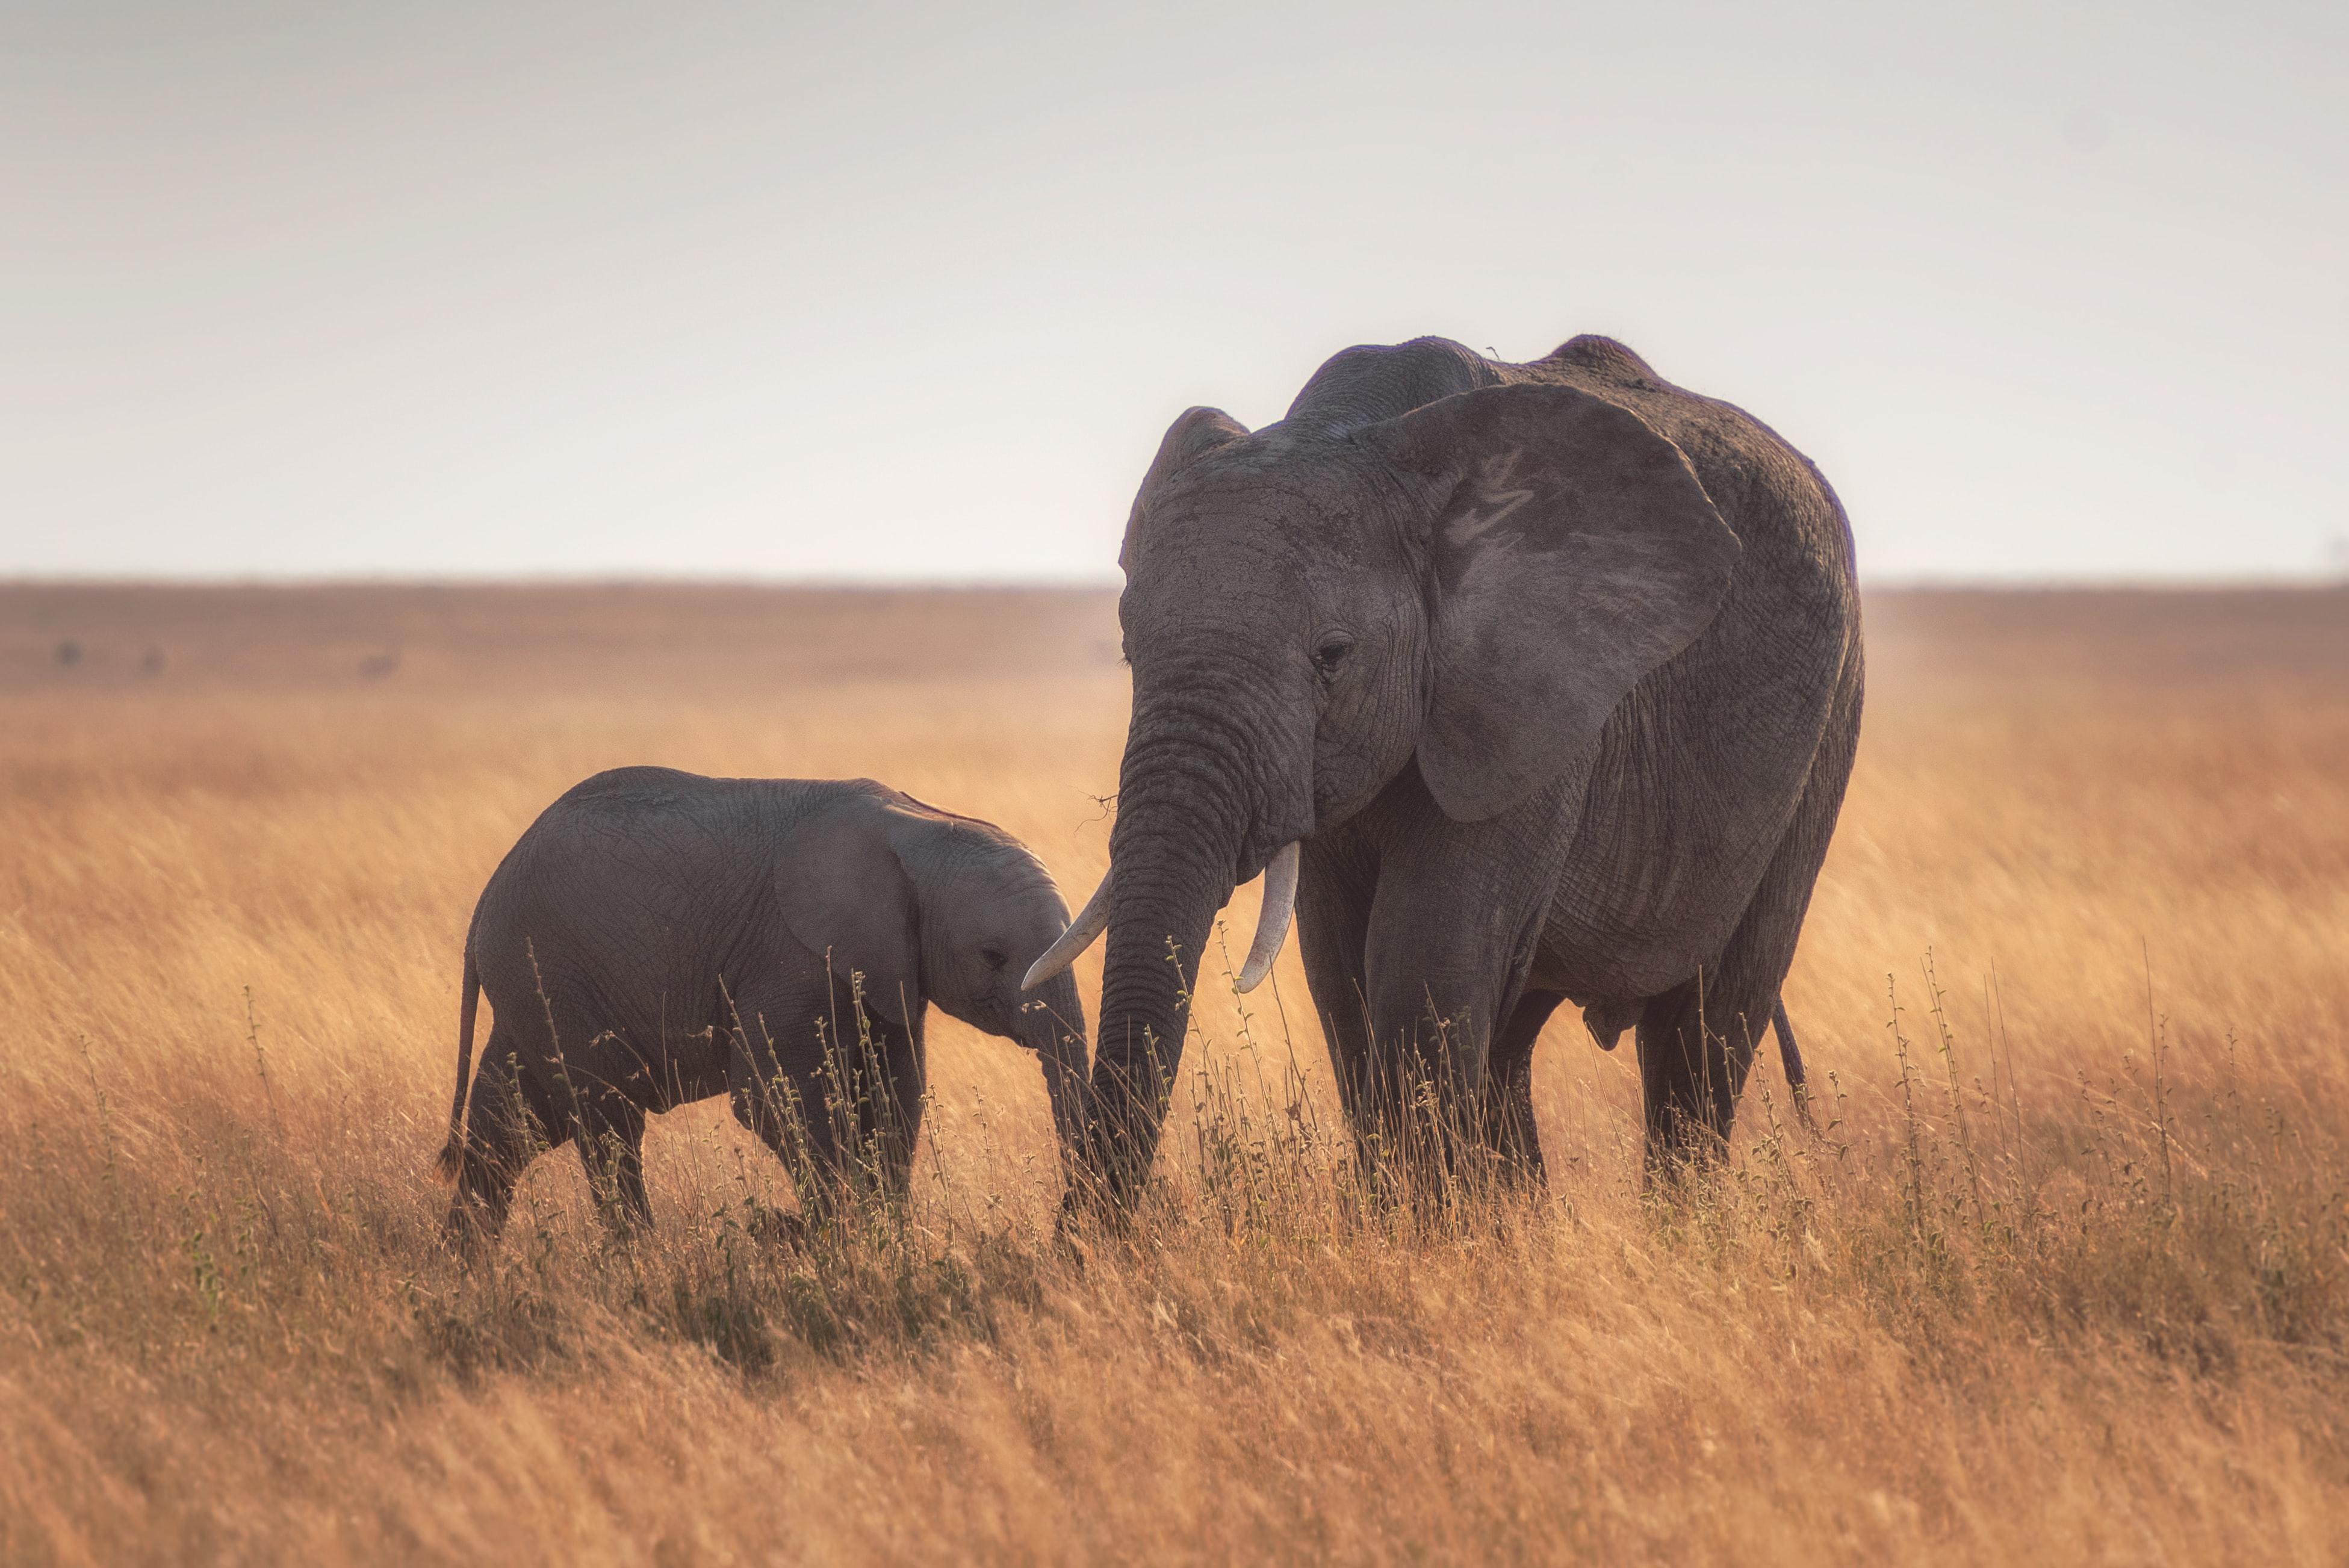 Baby Animal Elephant Wildlife 3902x2605